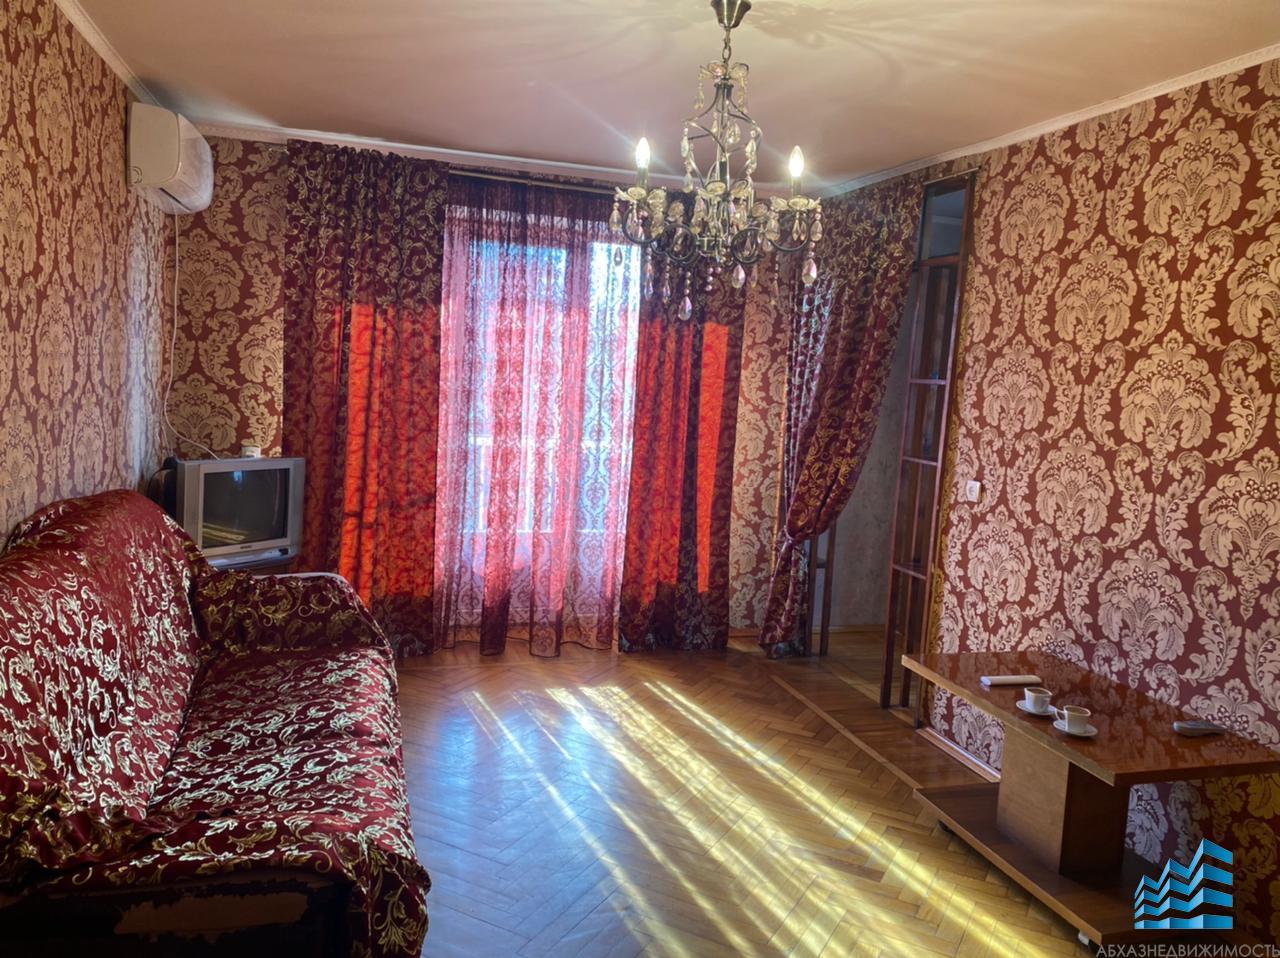 219. 2-х комн. квартира г. Сухум, район Турбаза